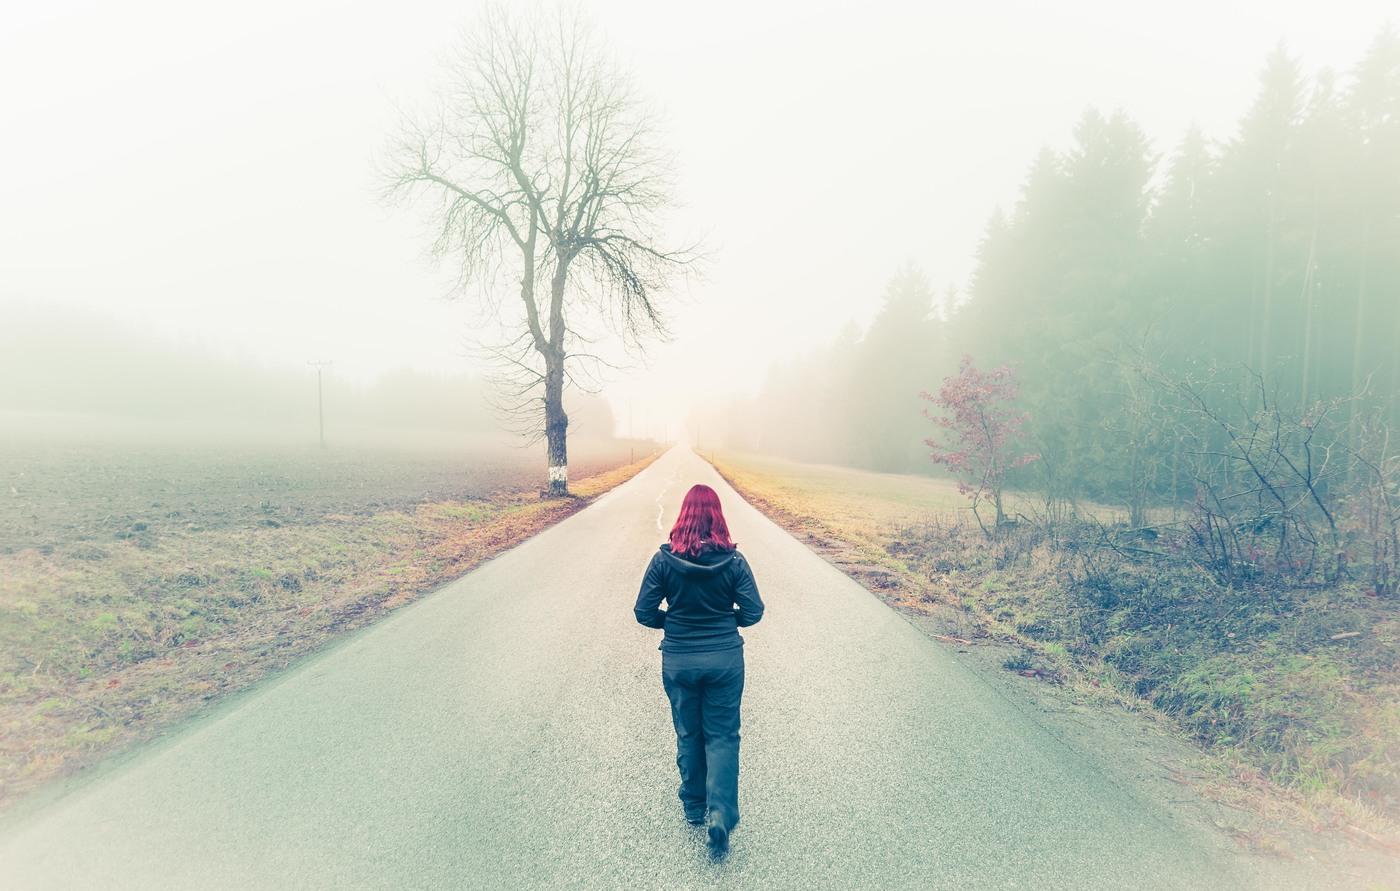 Cesta mlhou